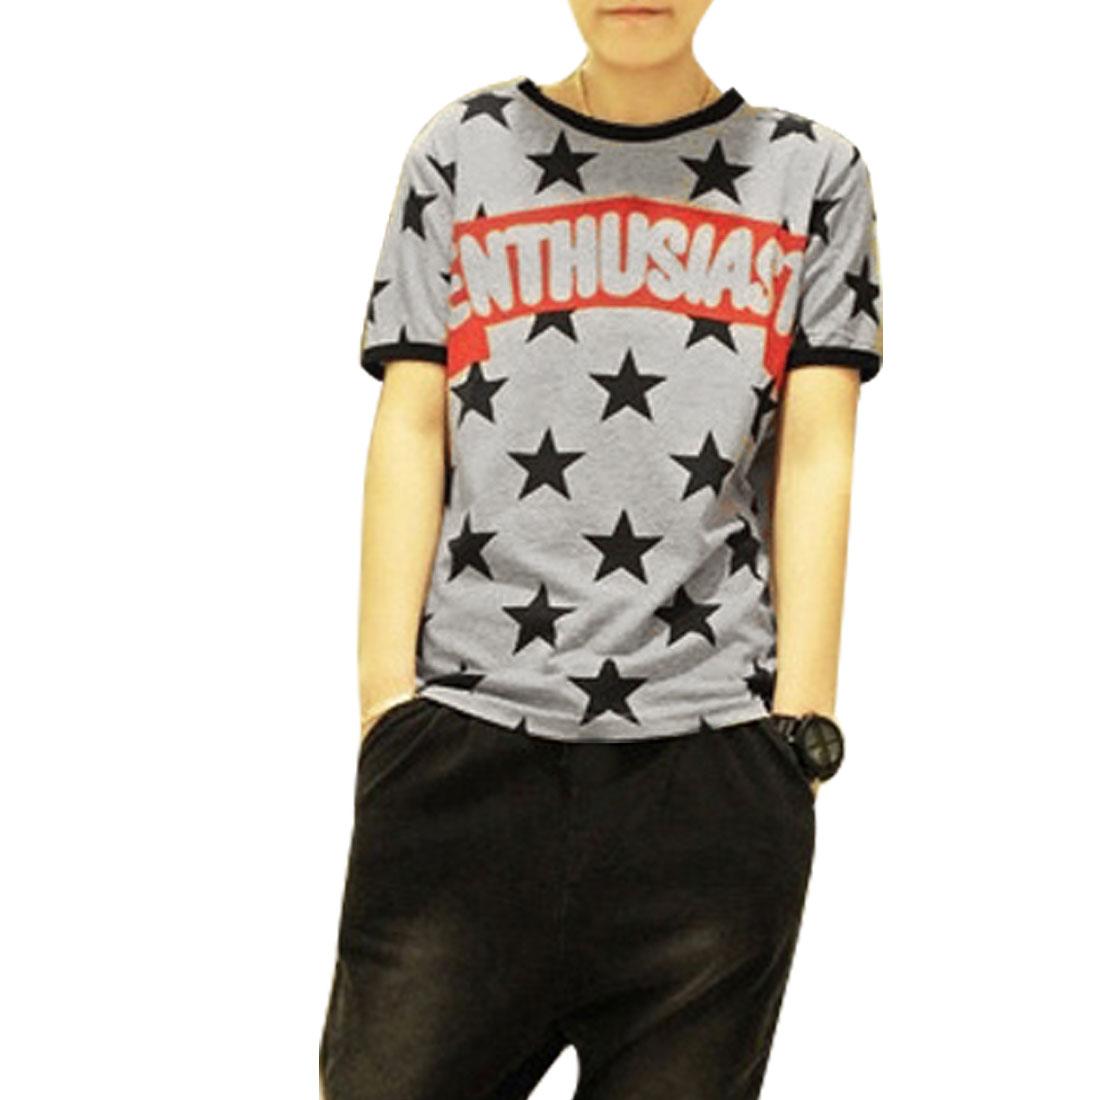 Man Fashional Round Neck Stars Pattern Leisure T-Shirt Blouse Black Gray M